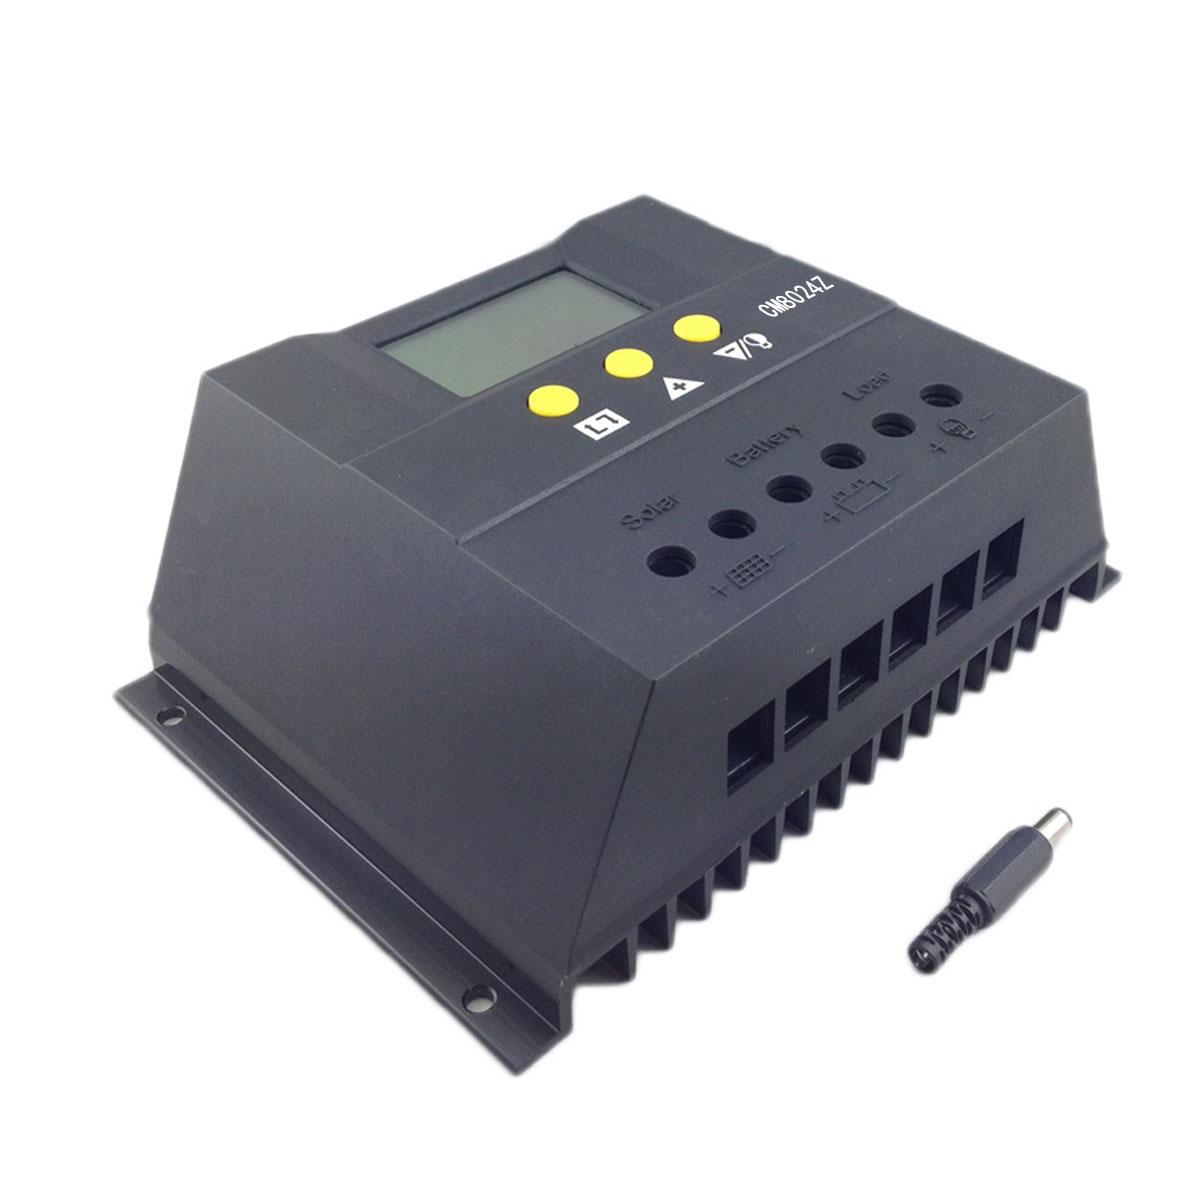 цена на 12V/24V 80A Solar Charge Controller PWM DC LCD Screen Battery Charger Regulator